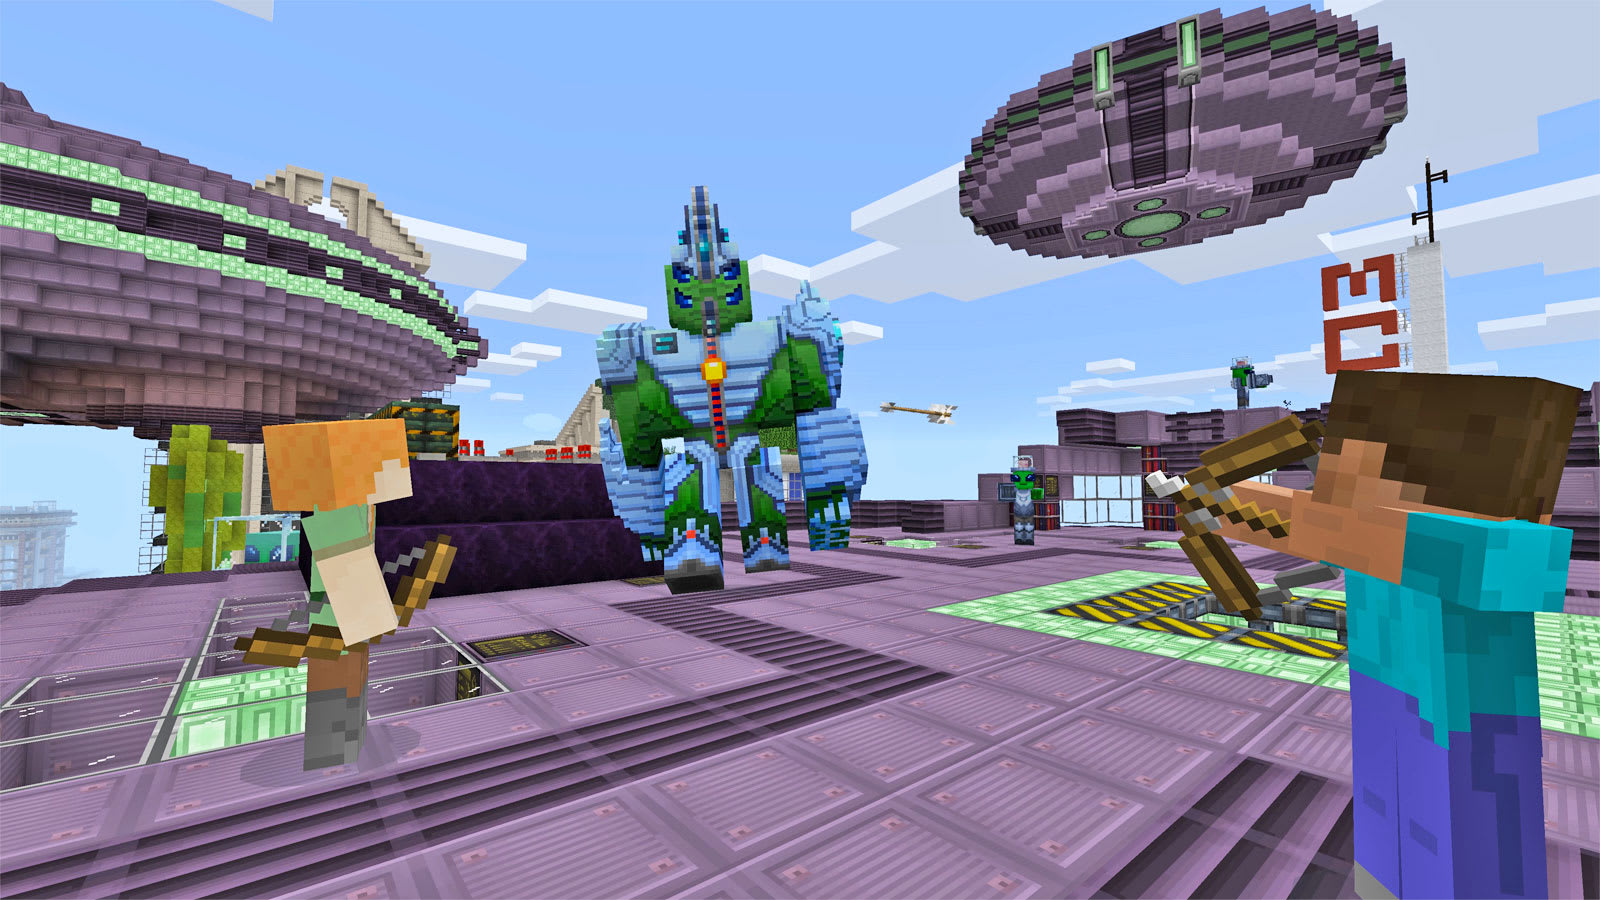 minecraft updates ile ilgili görsel sonucu